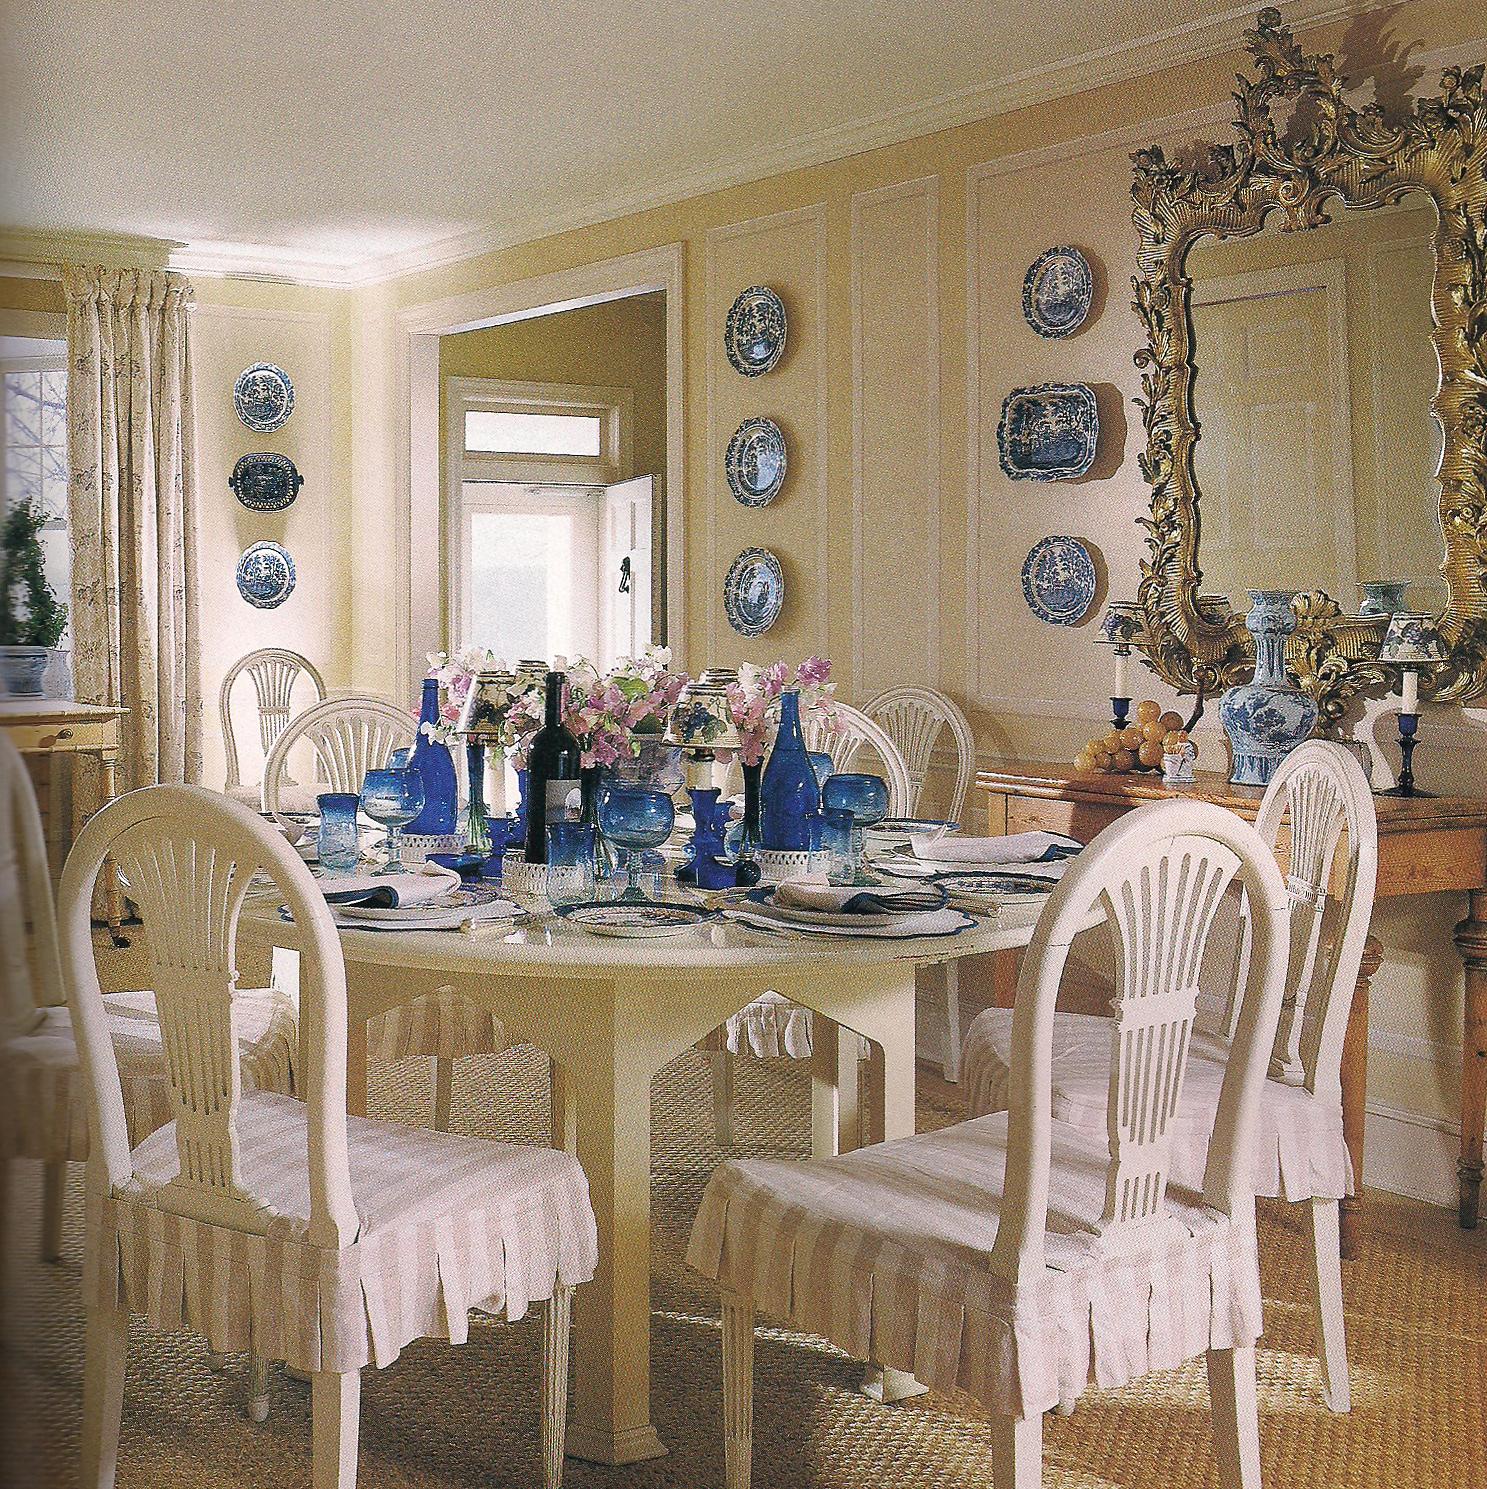 Hampton Terrace Apartments: 1000+ Images About Designer: Mark Hampton On Pinterest